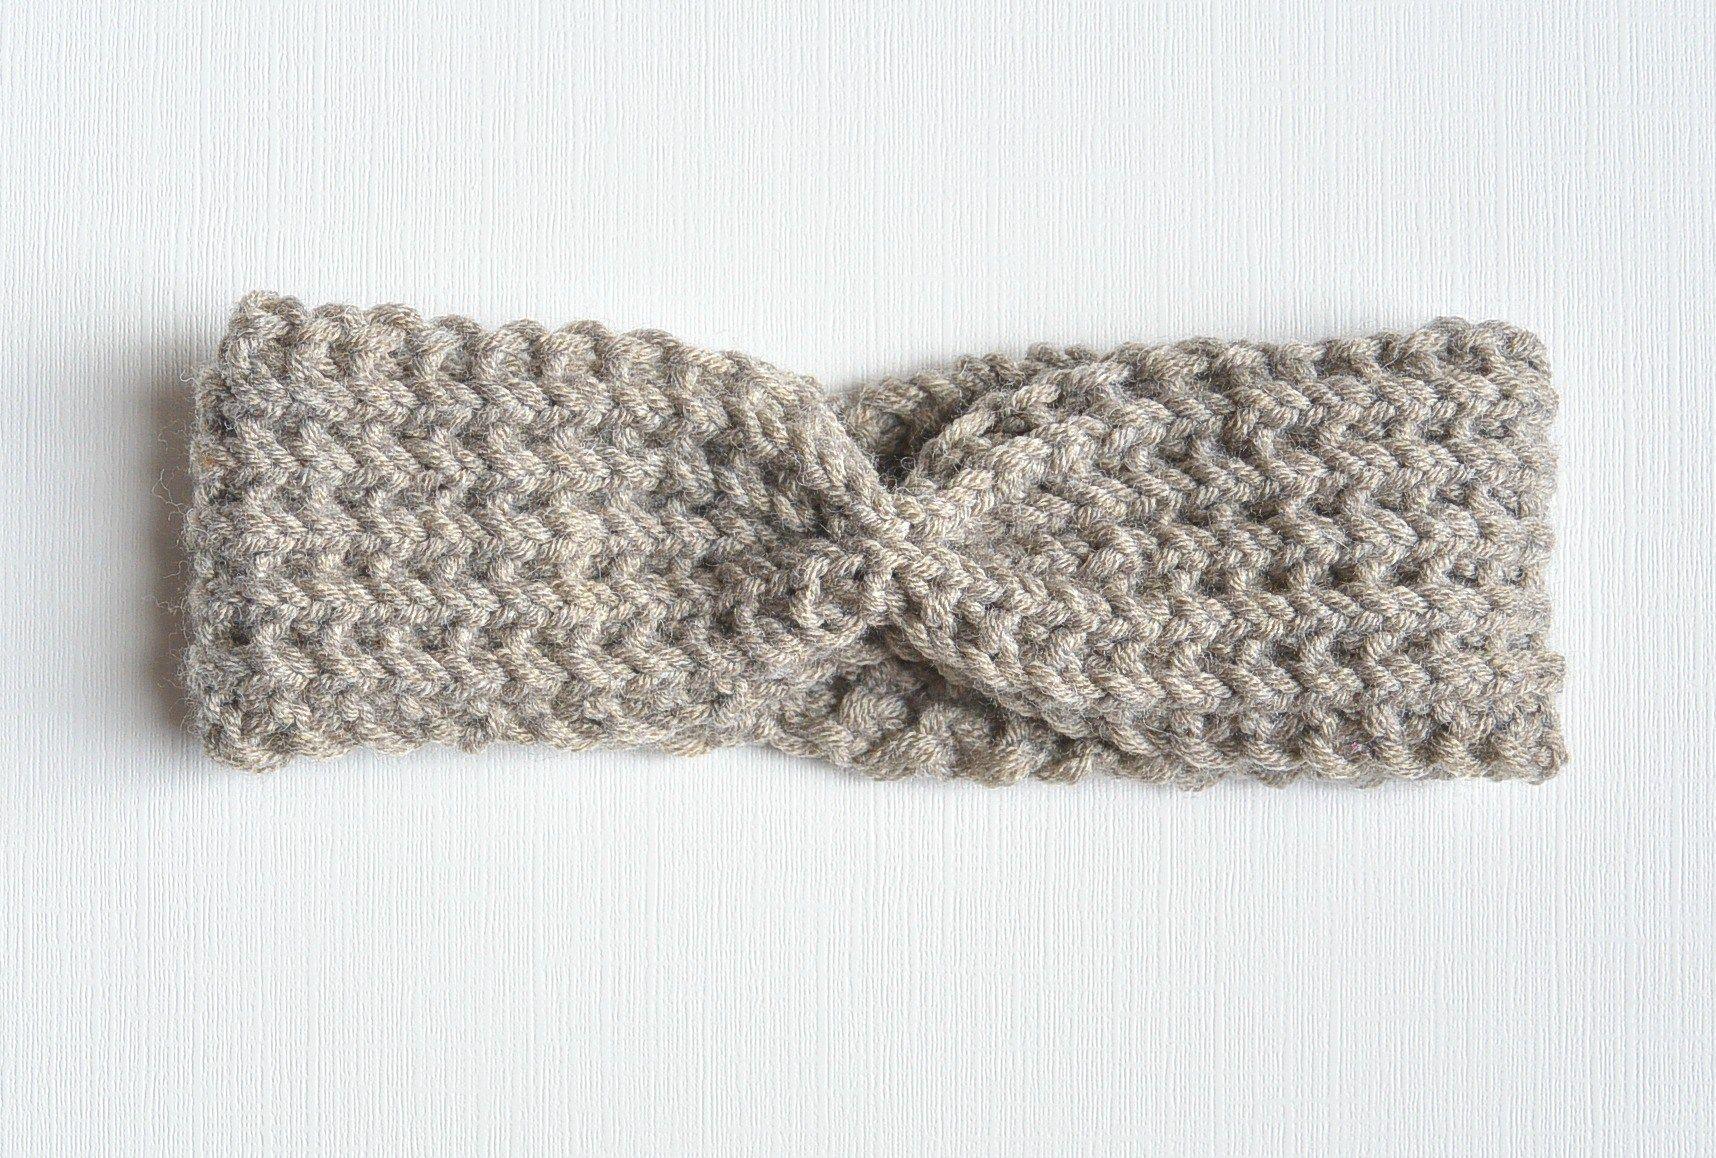 Half Fisherman Knit Headband & Downton Abbey Yarn | Knit ...